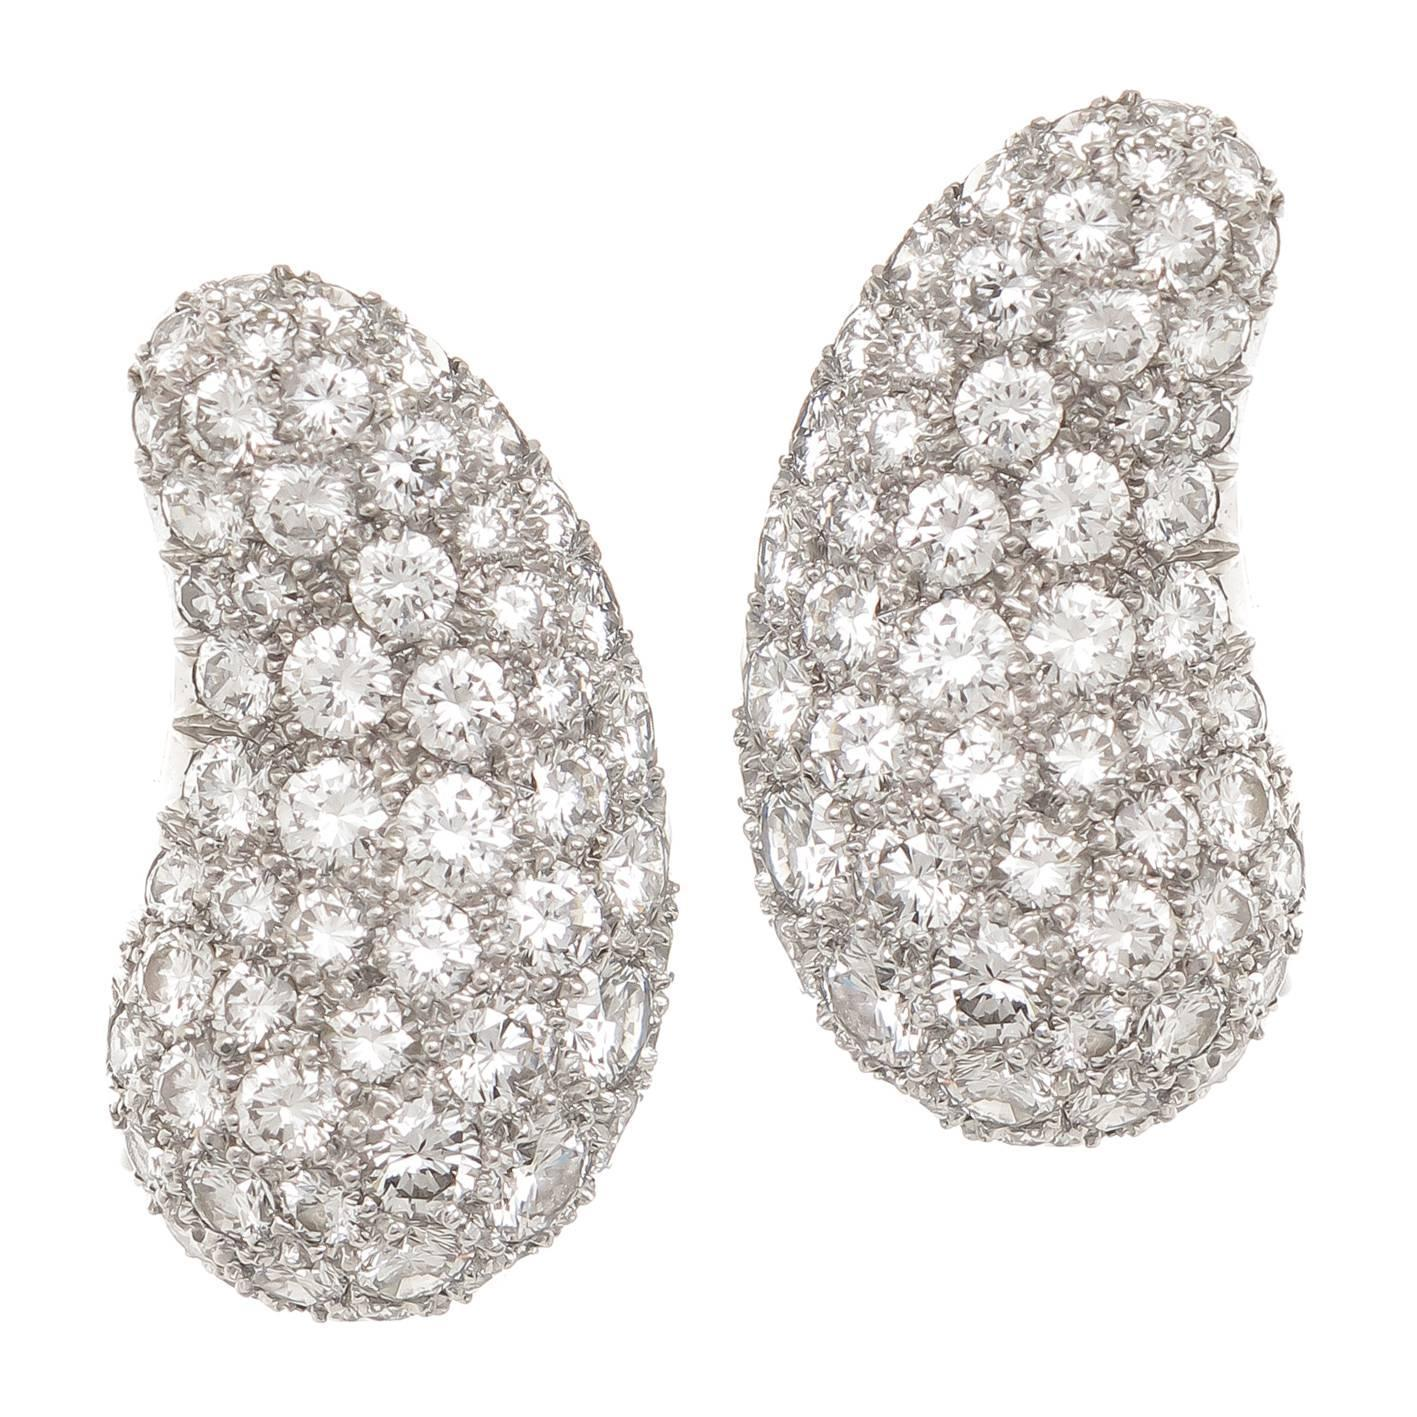 Tiffany and Co Elsa Peretti Diamond Platinum Bean Earrings at 1stdibs